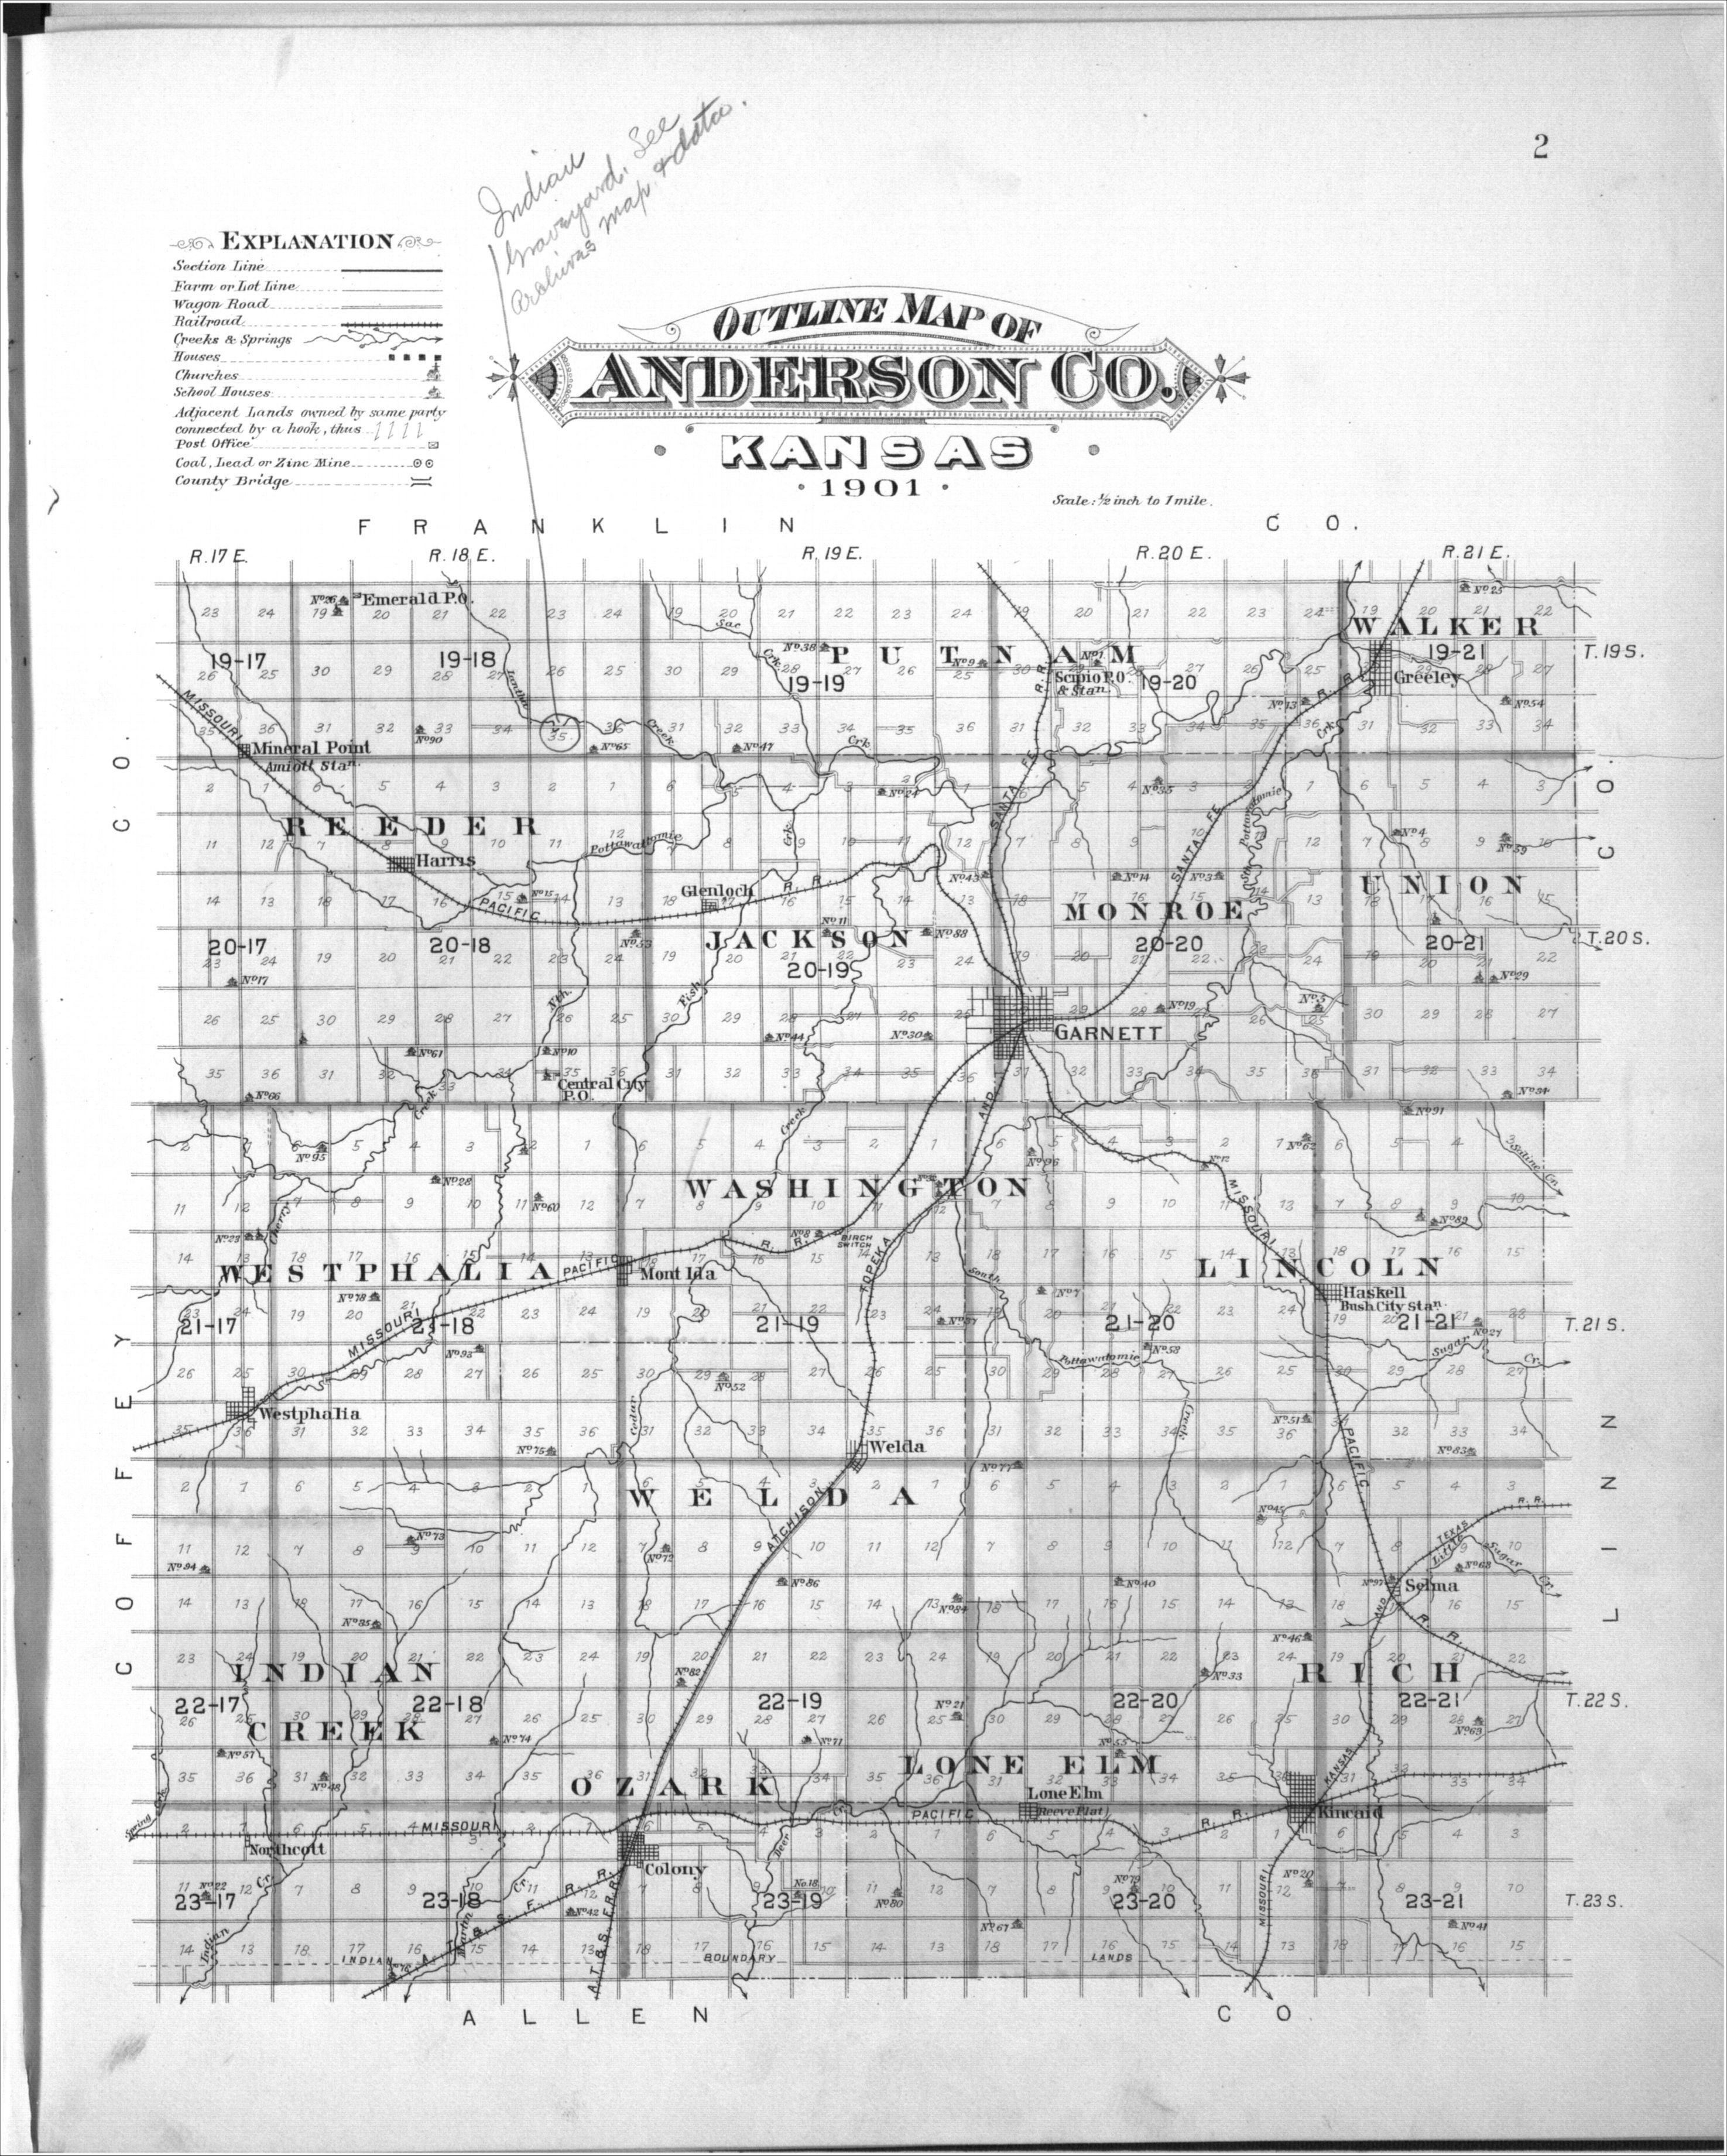 Plat book, Anderson County, Kansas - 34